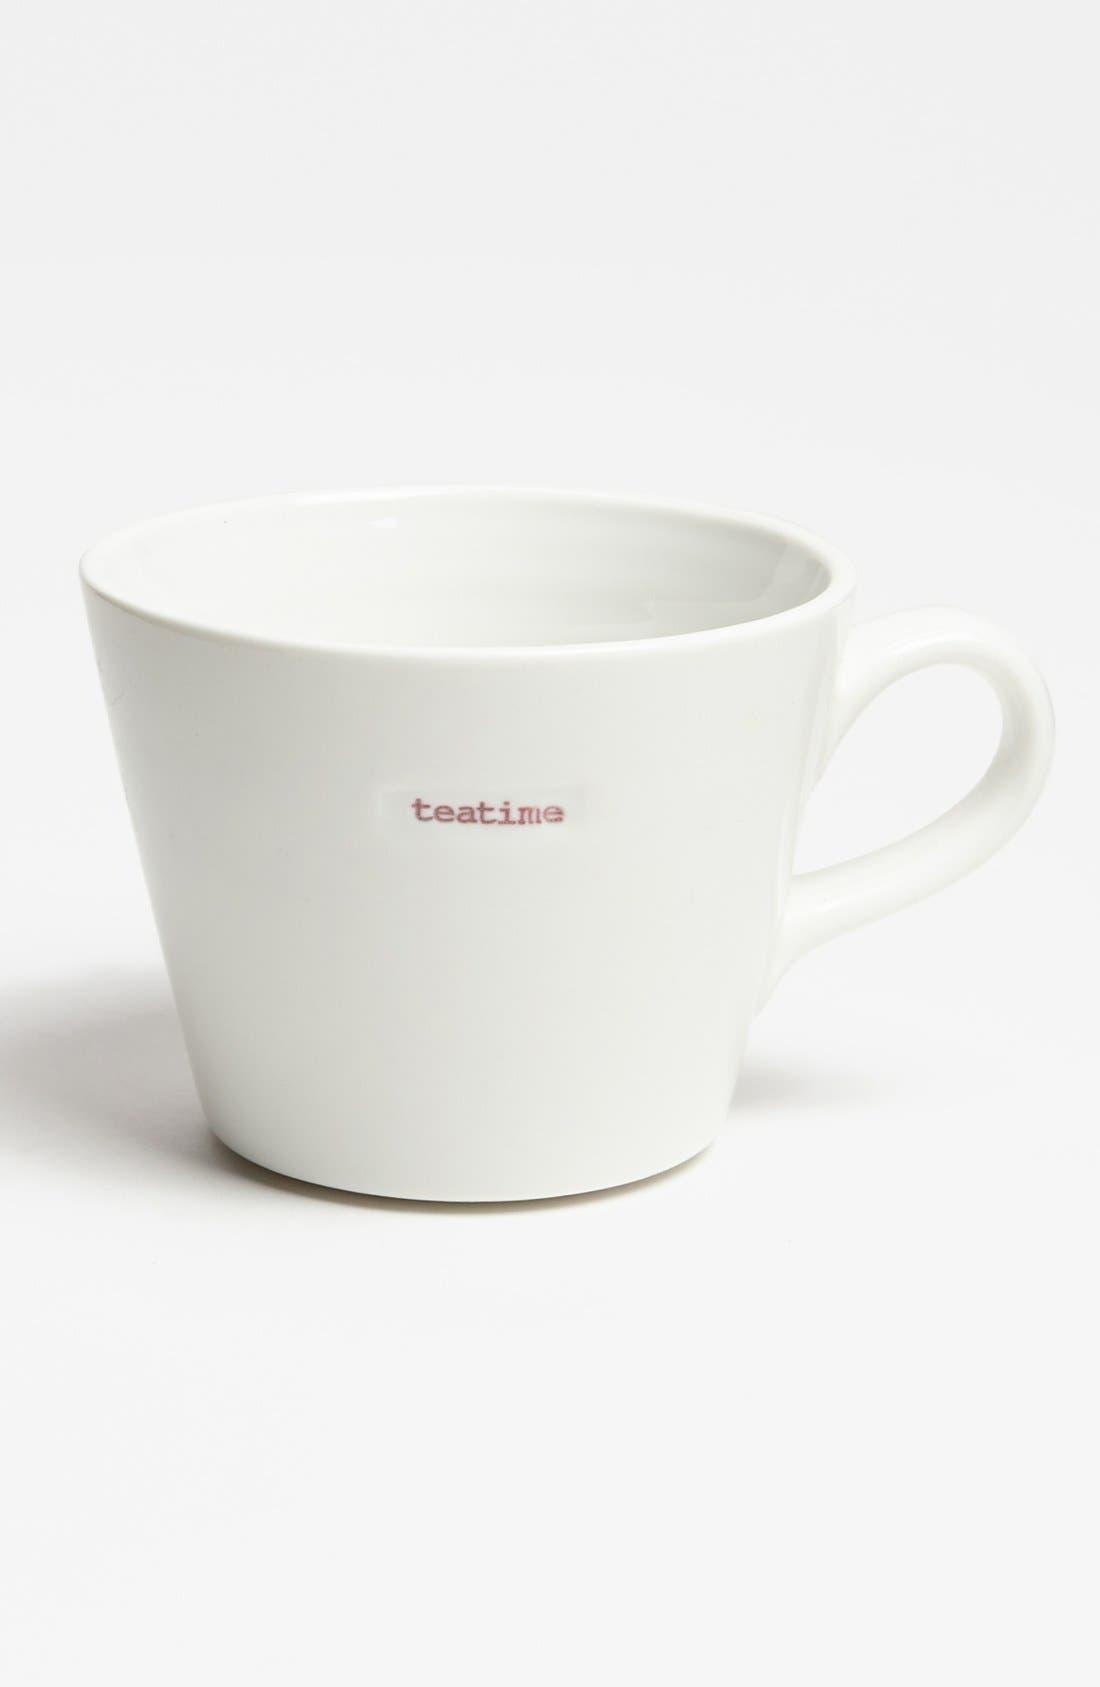 Main Image - 'Word Range - Teatime' Porcelain Mug